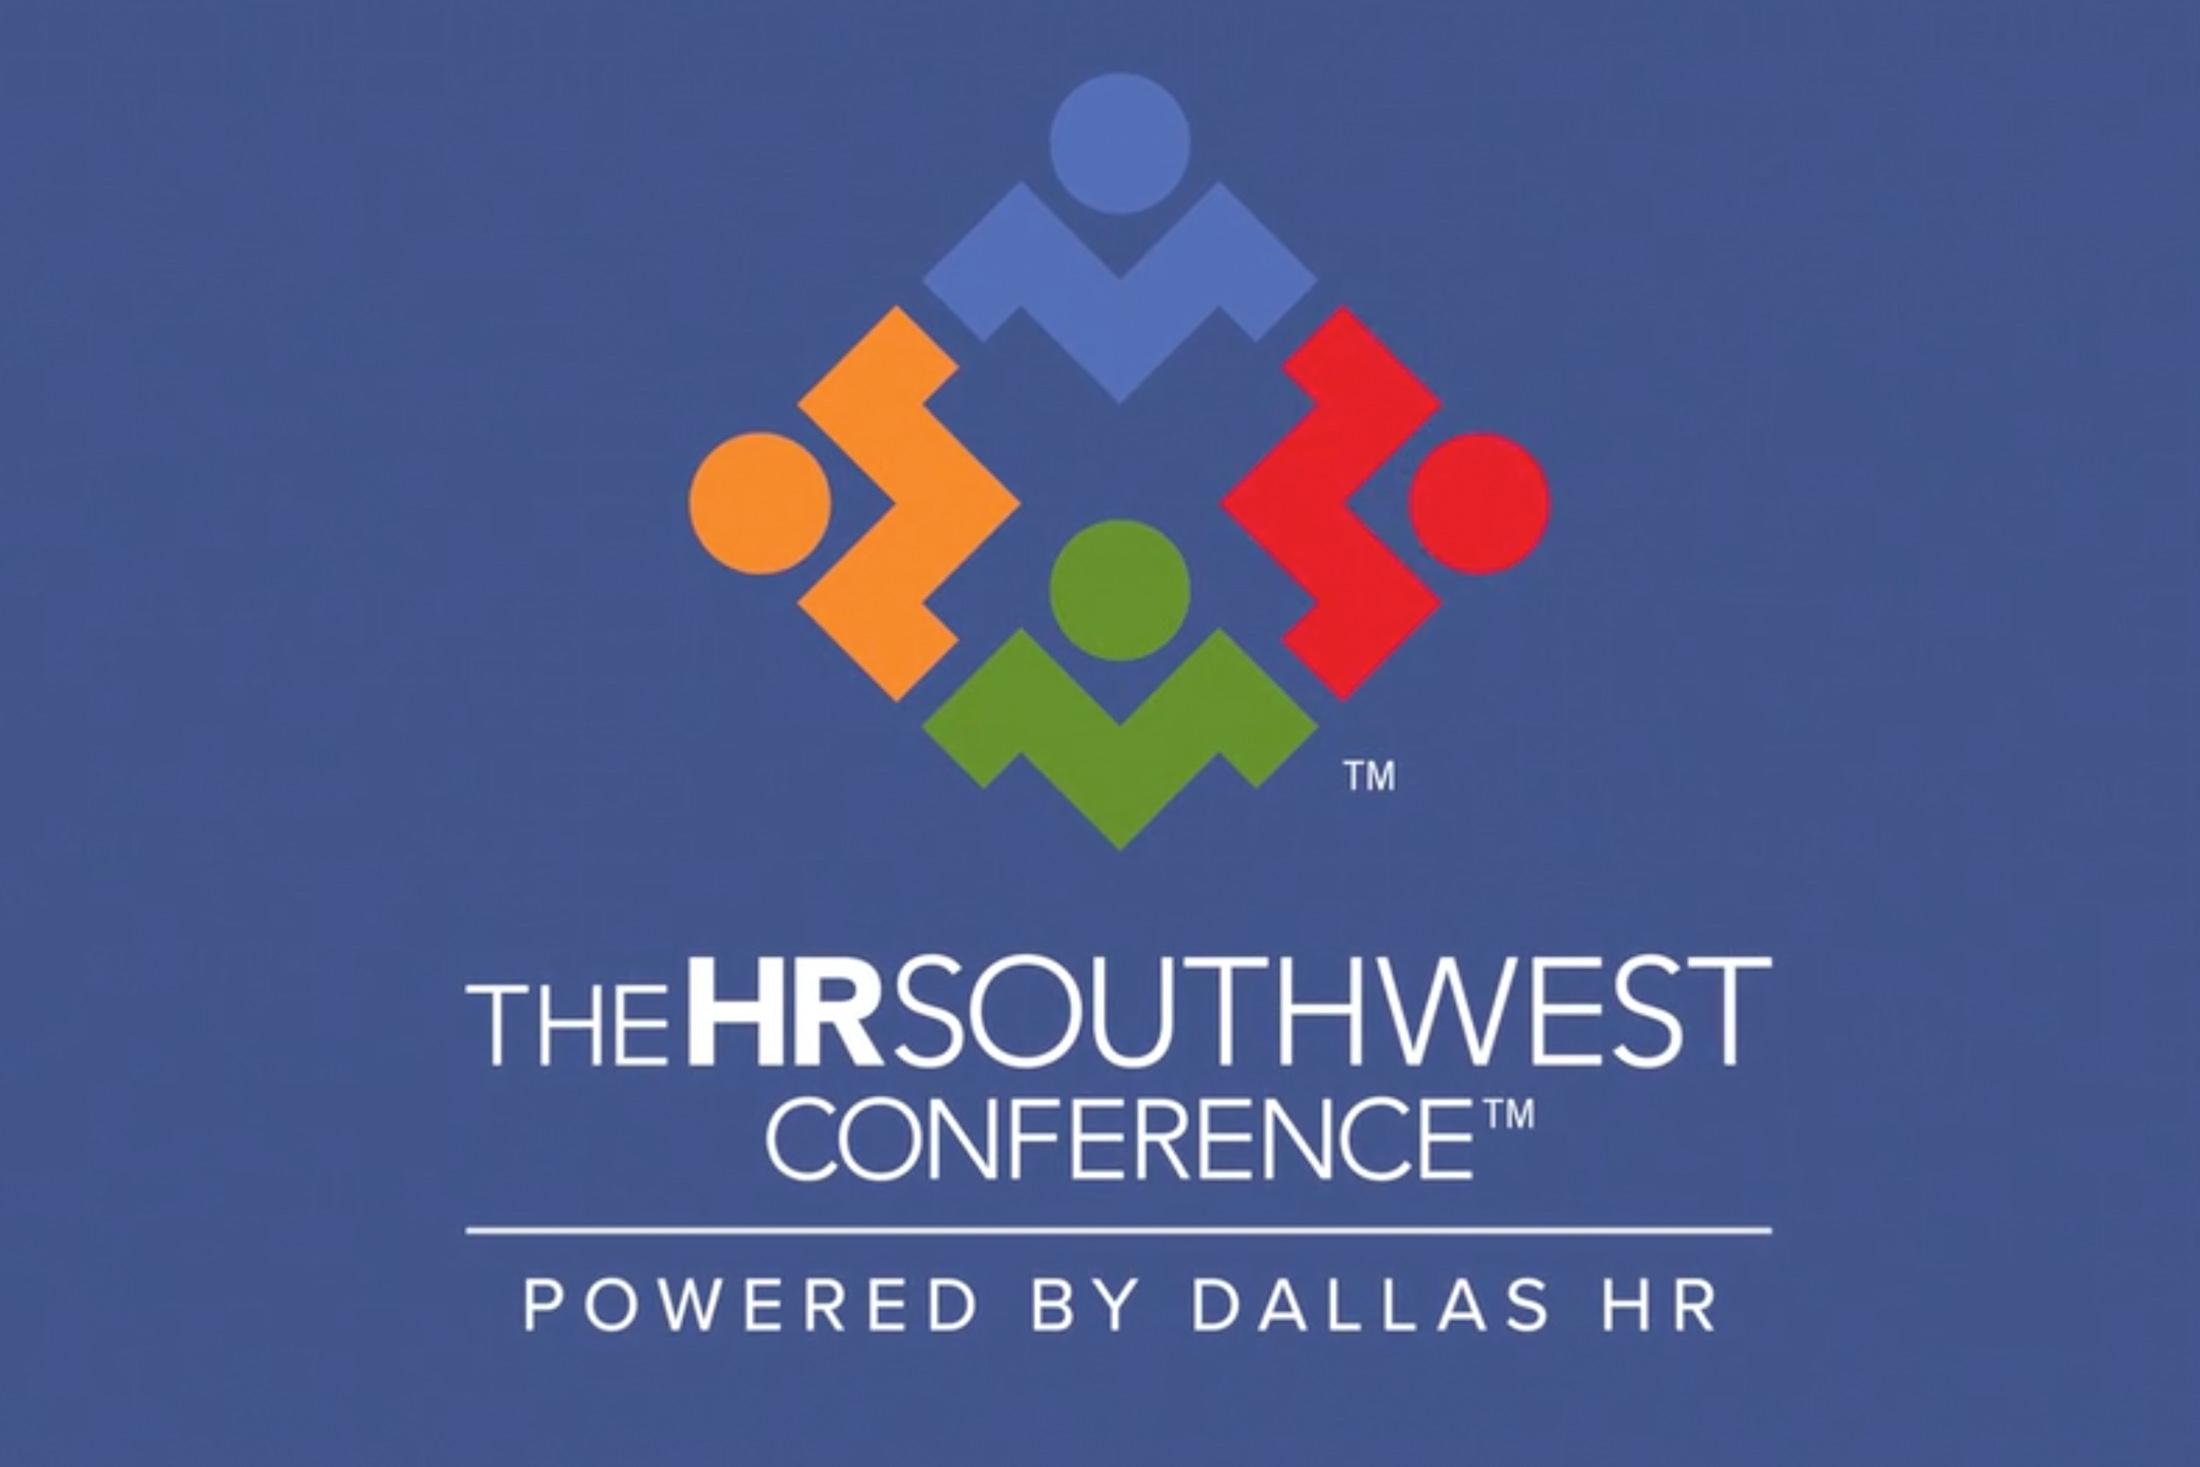 HR SouthWest